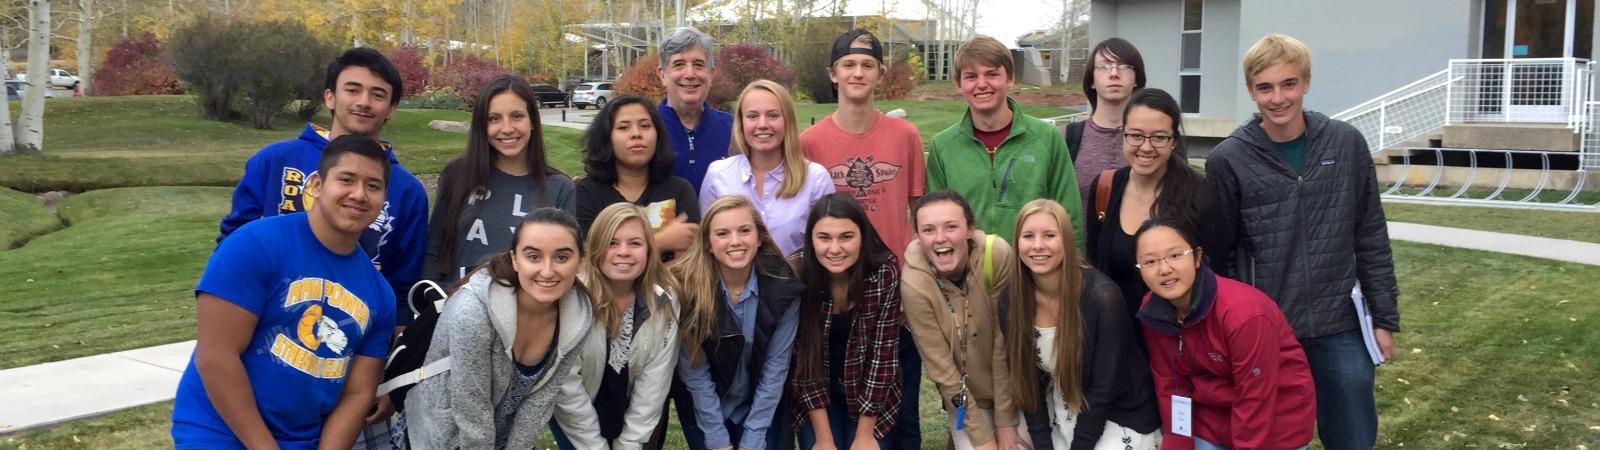 Hurst Student Seminars: Middle School Great Ideas 2017